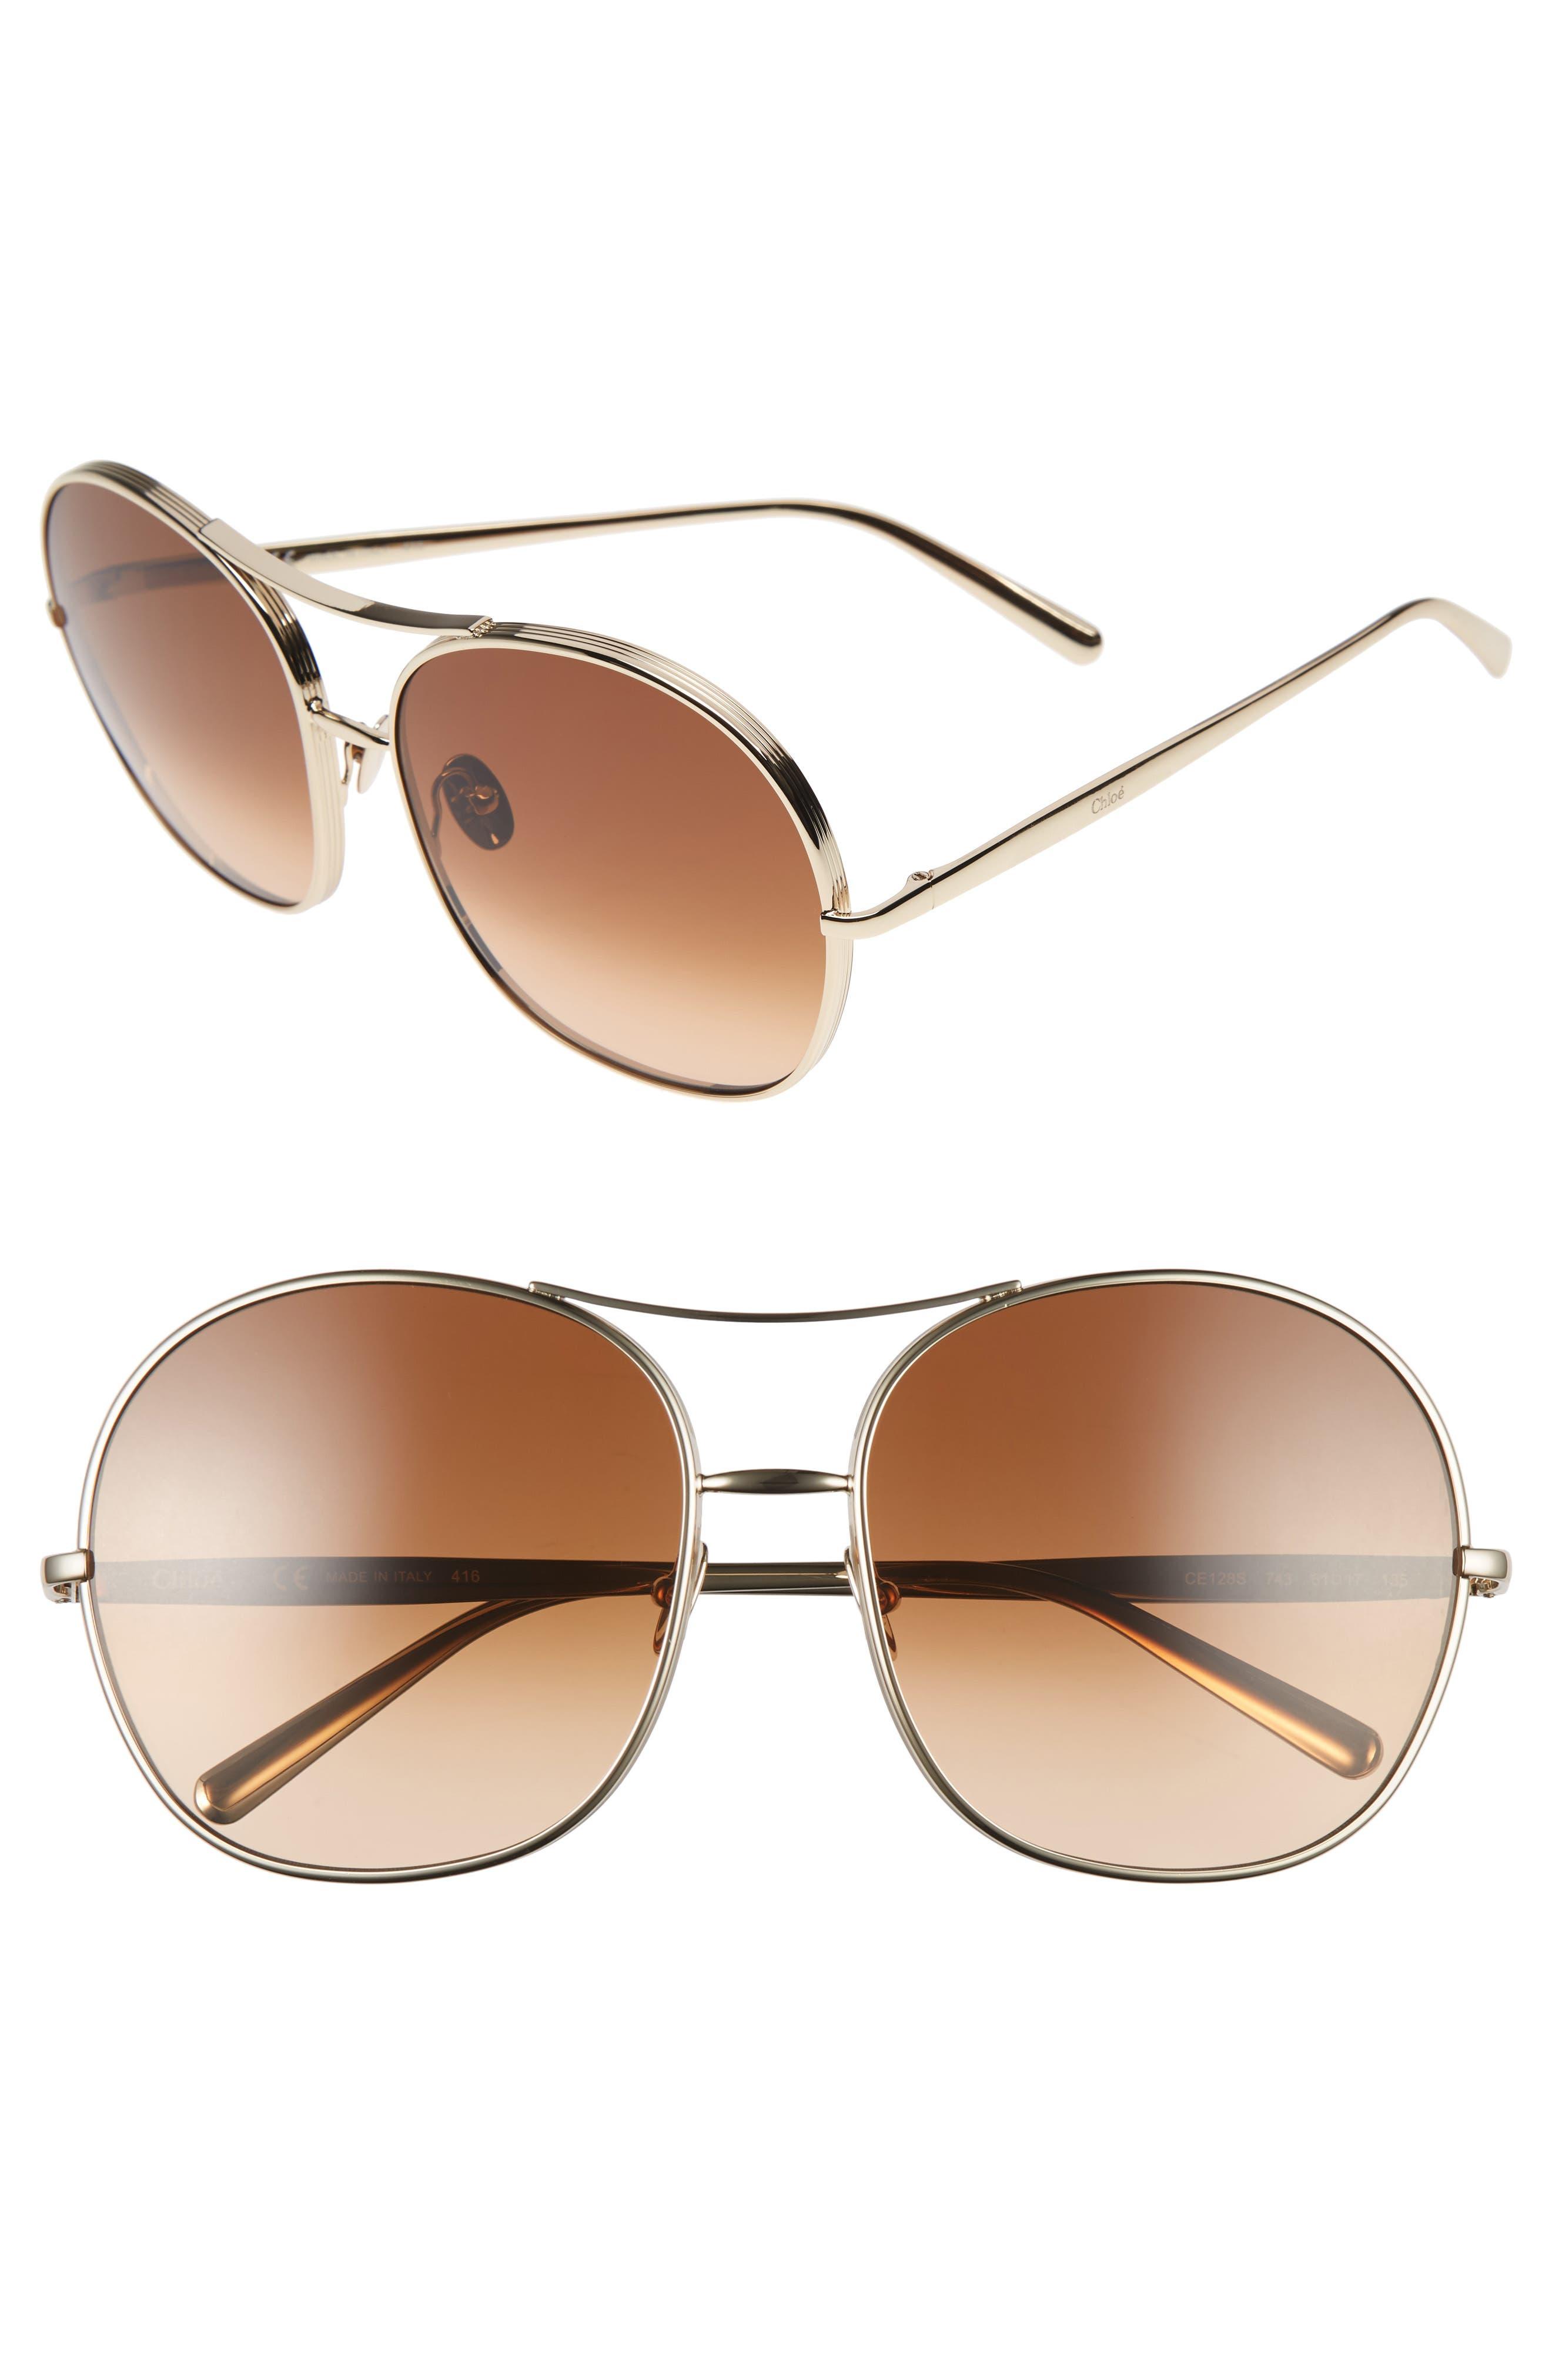 61mm Oversize Aviator Sunglasses,                             Main thumbnail 1, color,                             710